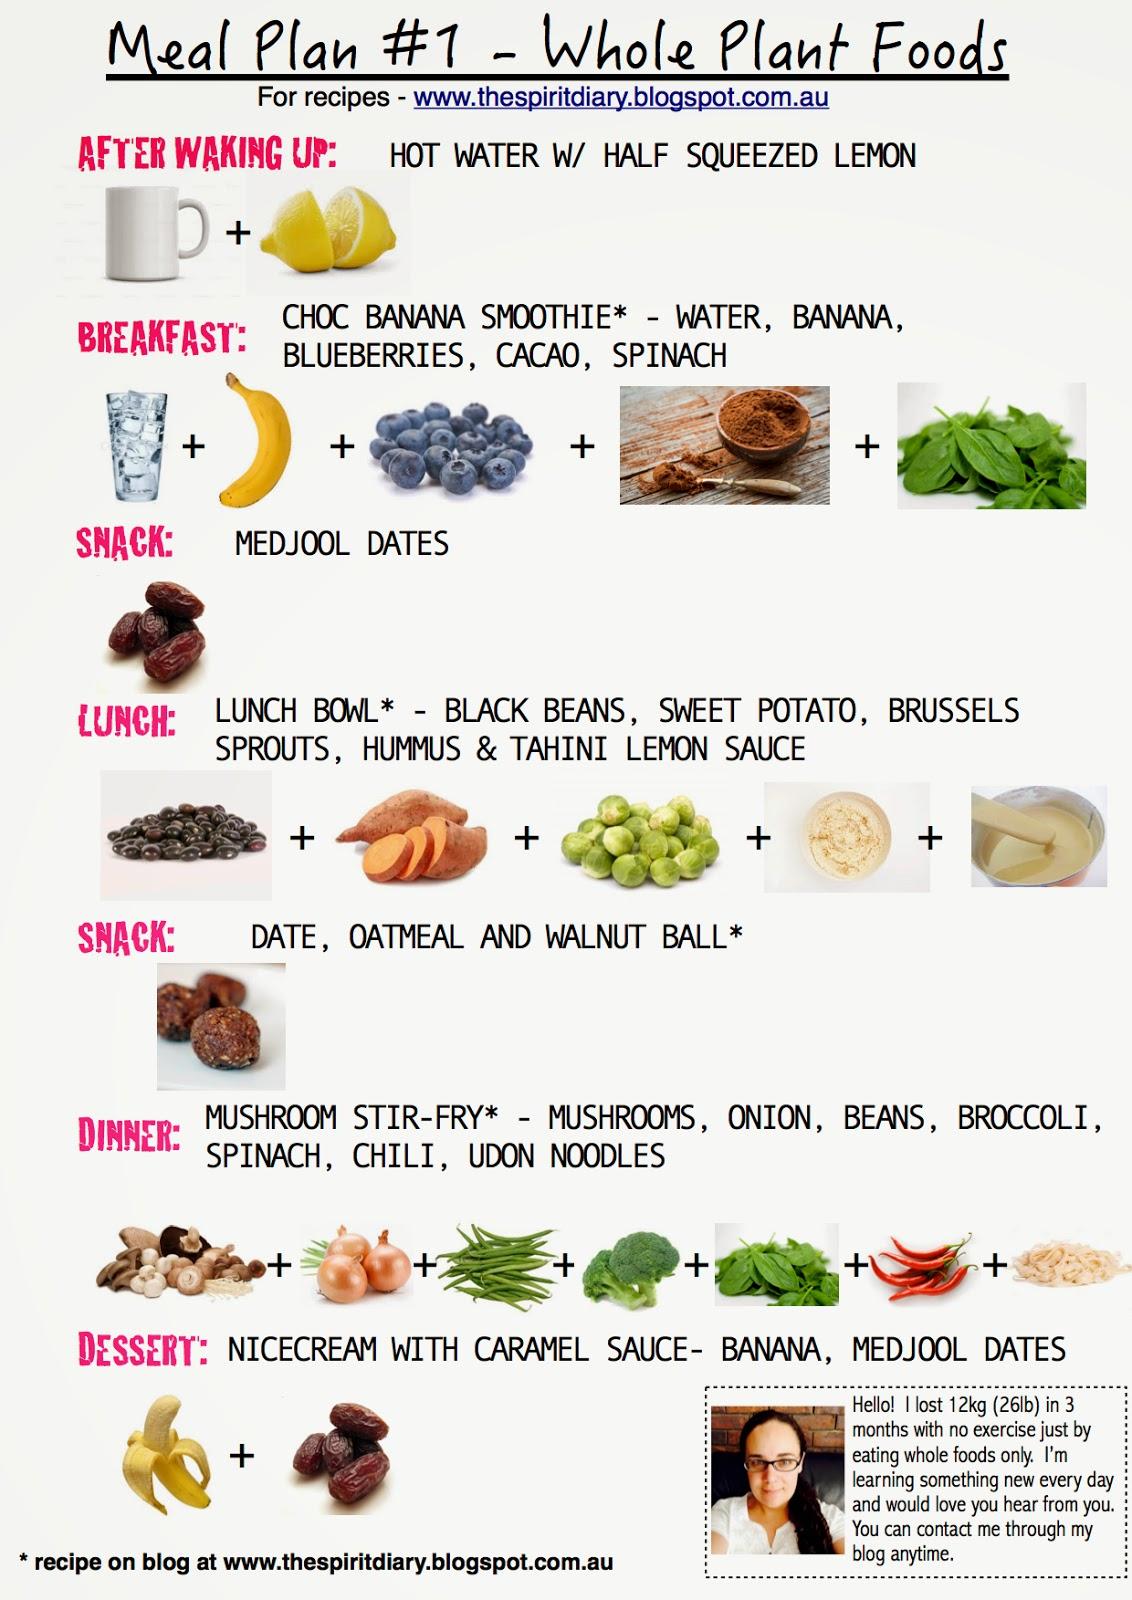 The One Ingredient Diet